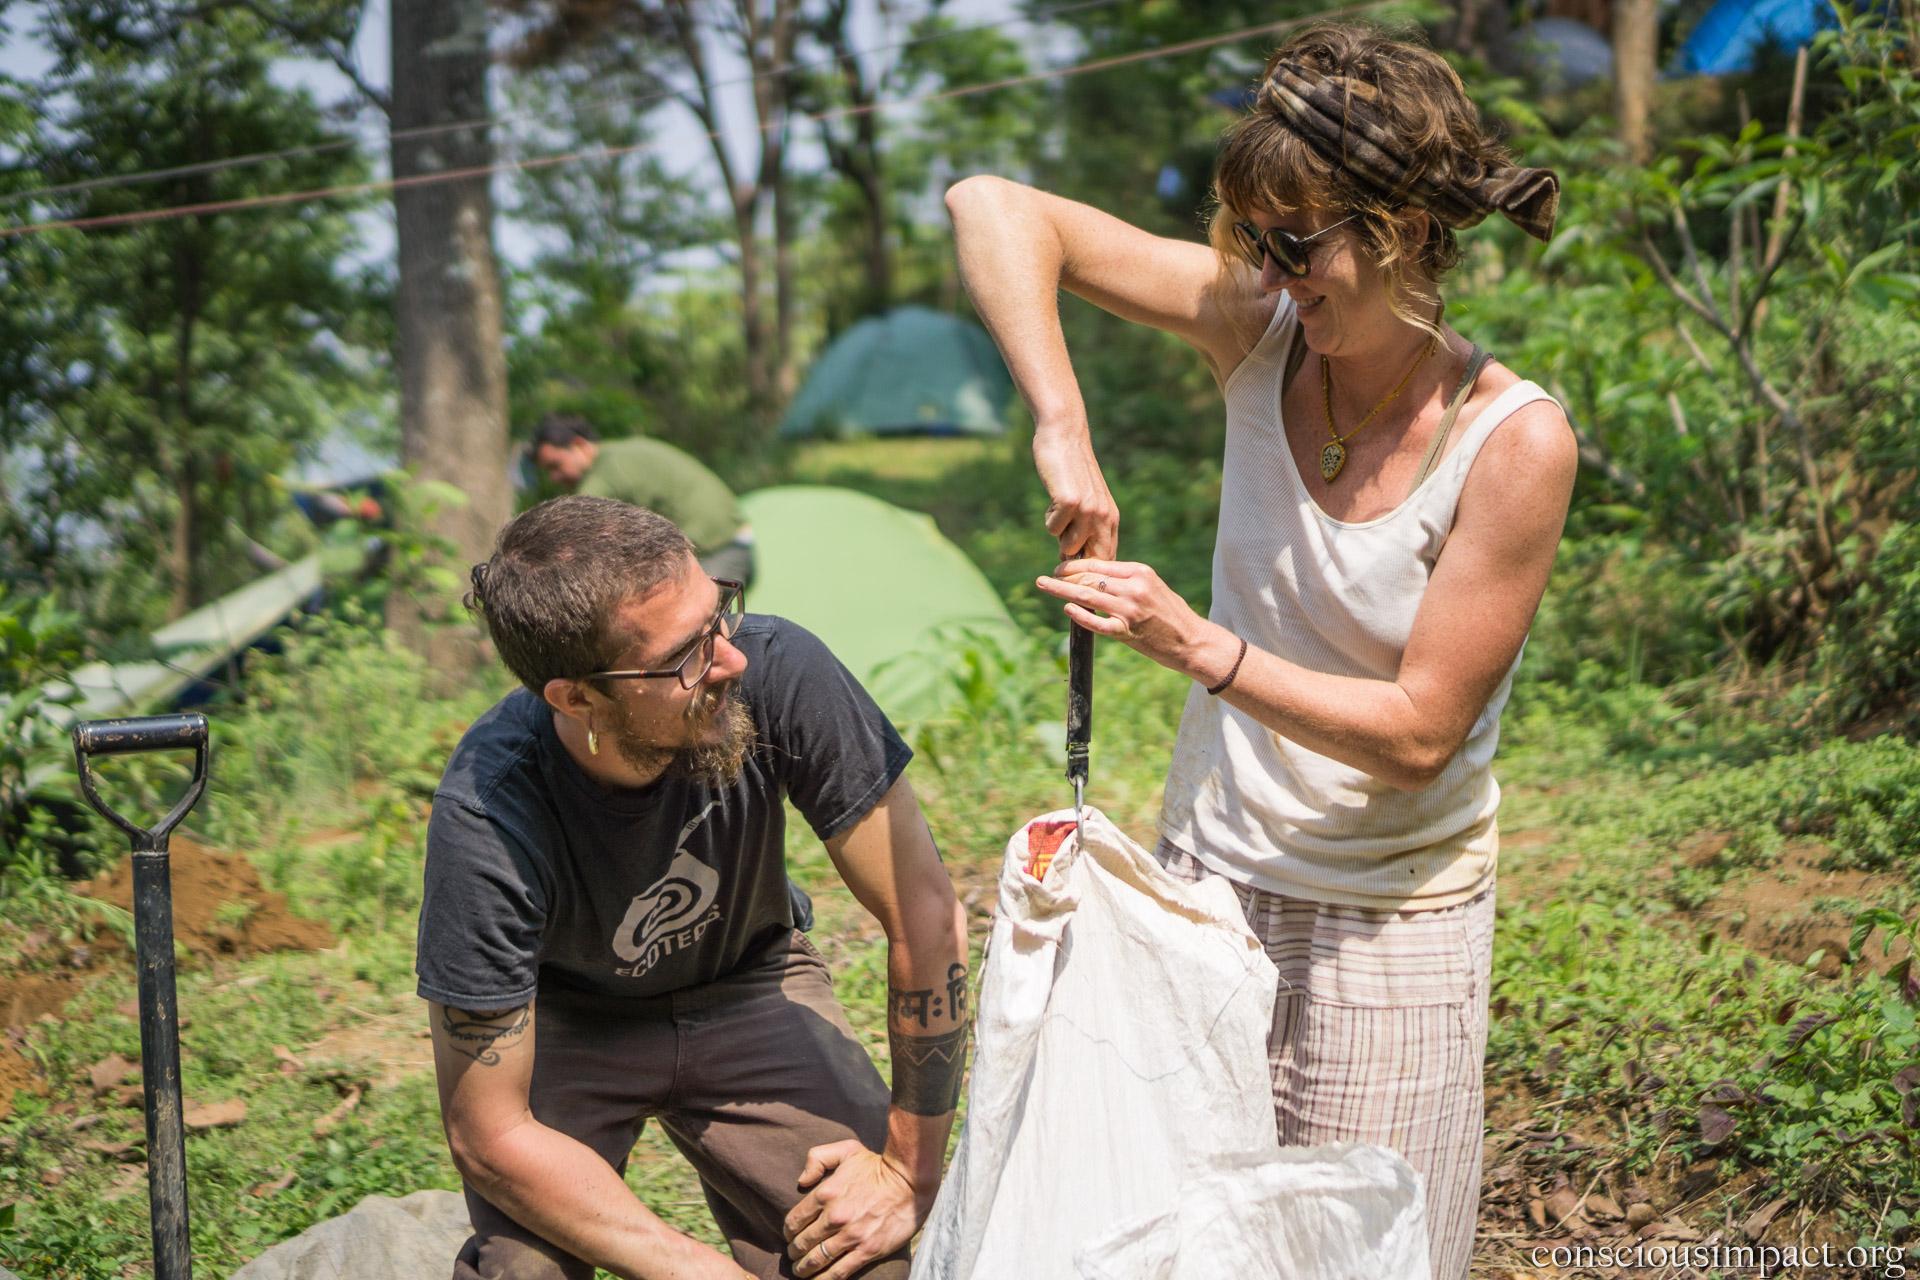 Volunteers Meryl and Jatesh measure 6 kg of humanure per tree!